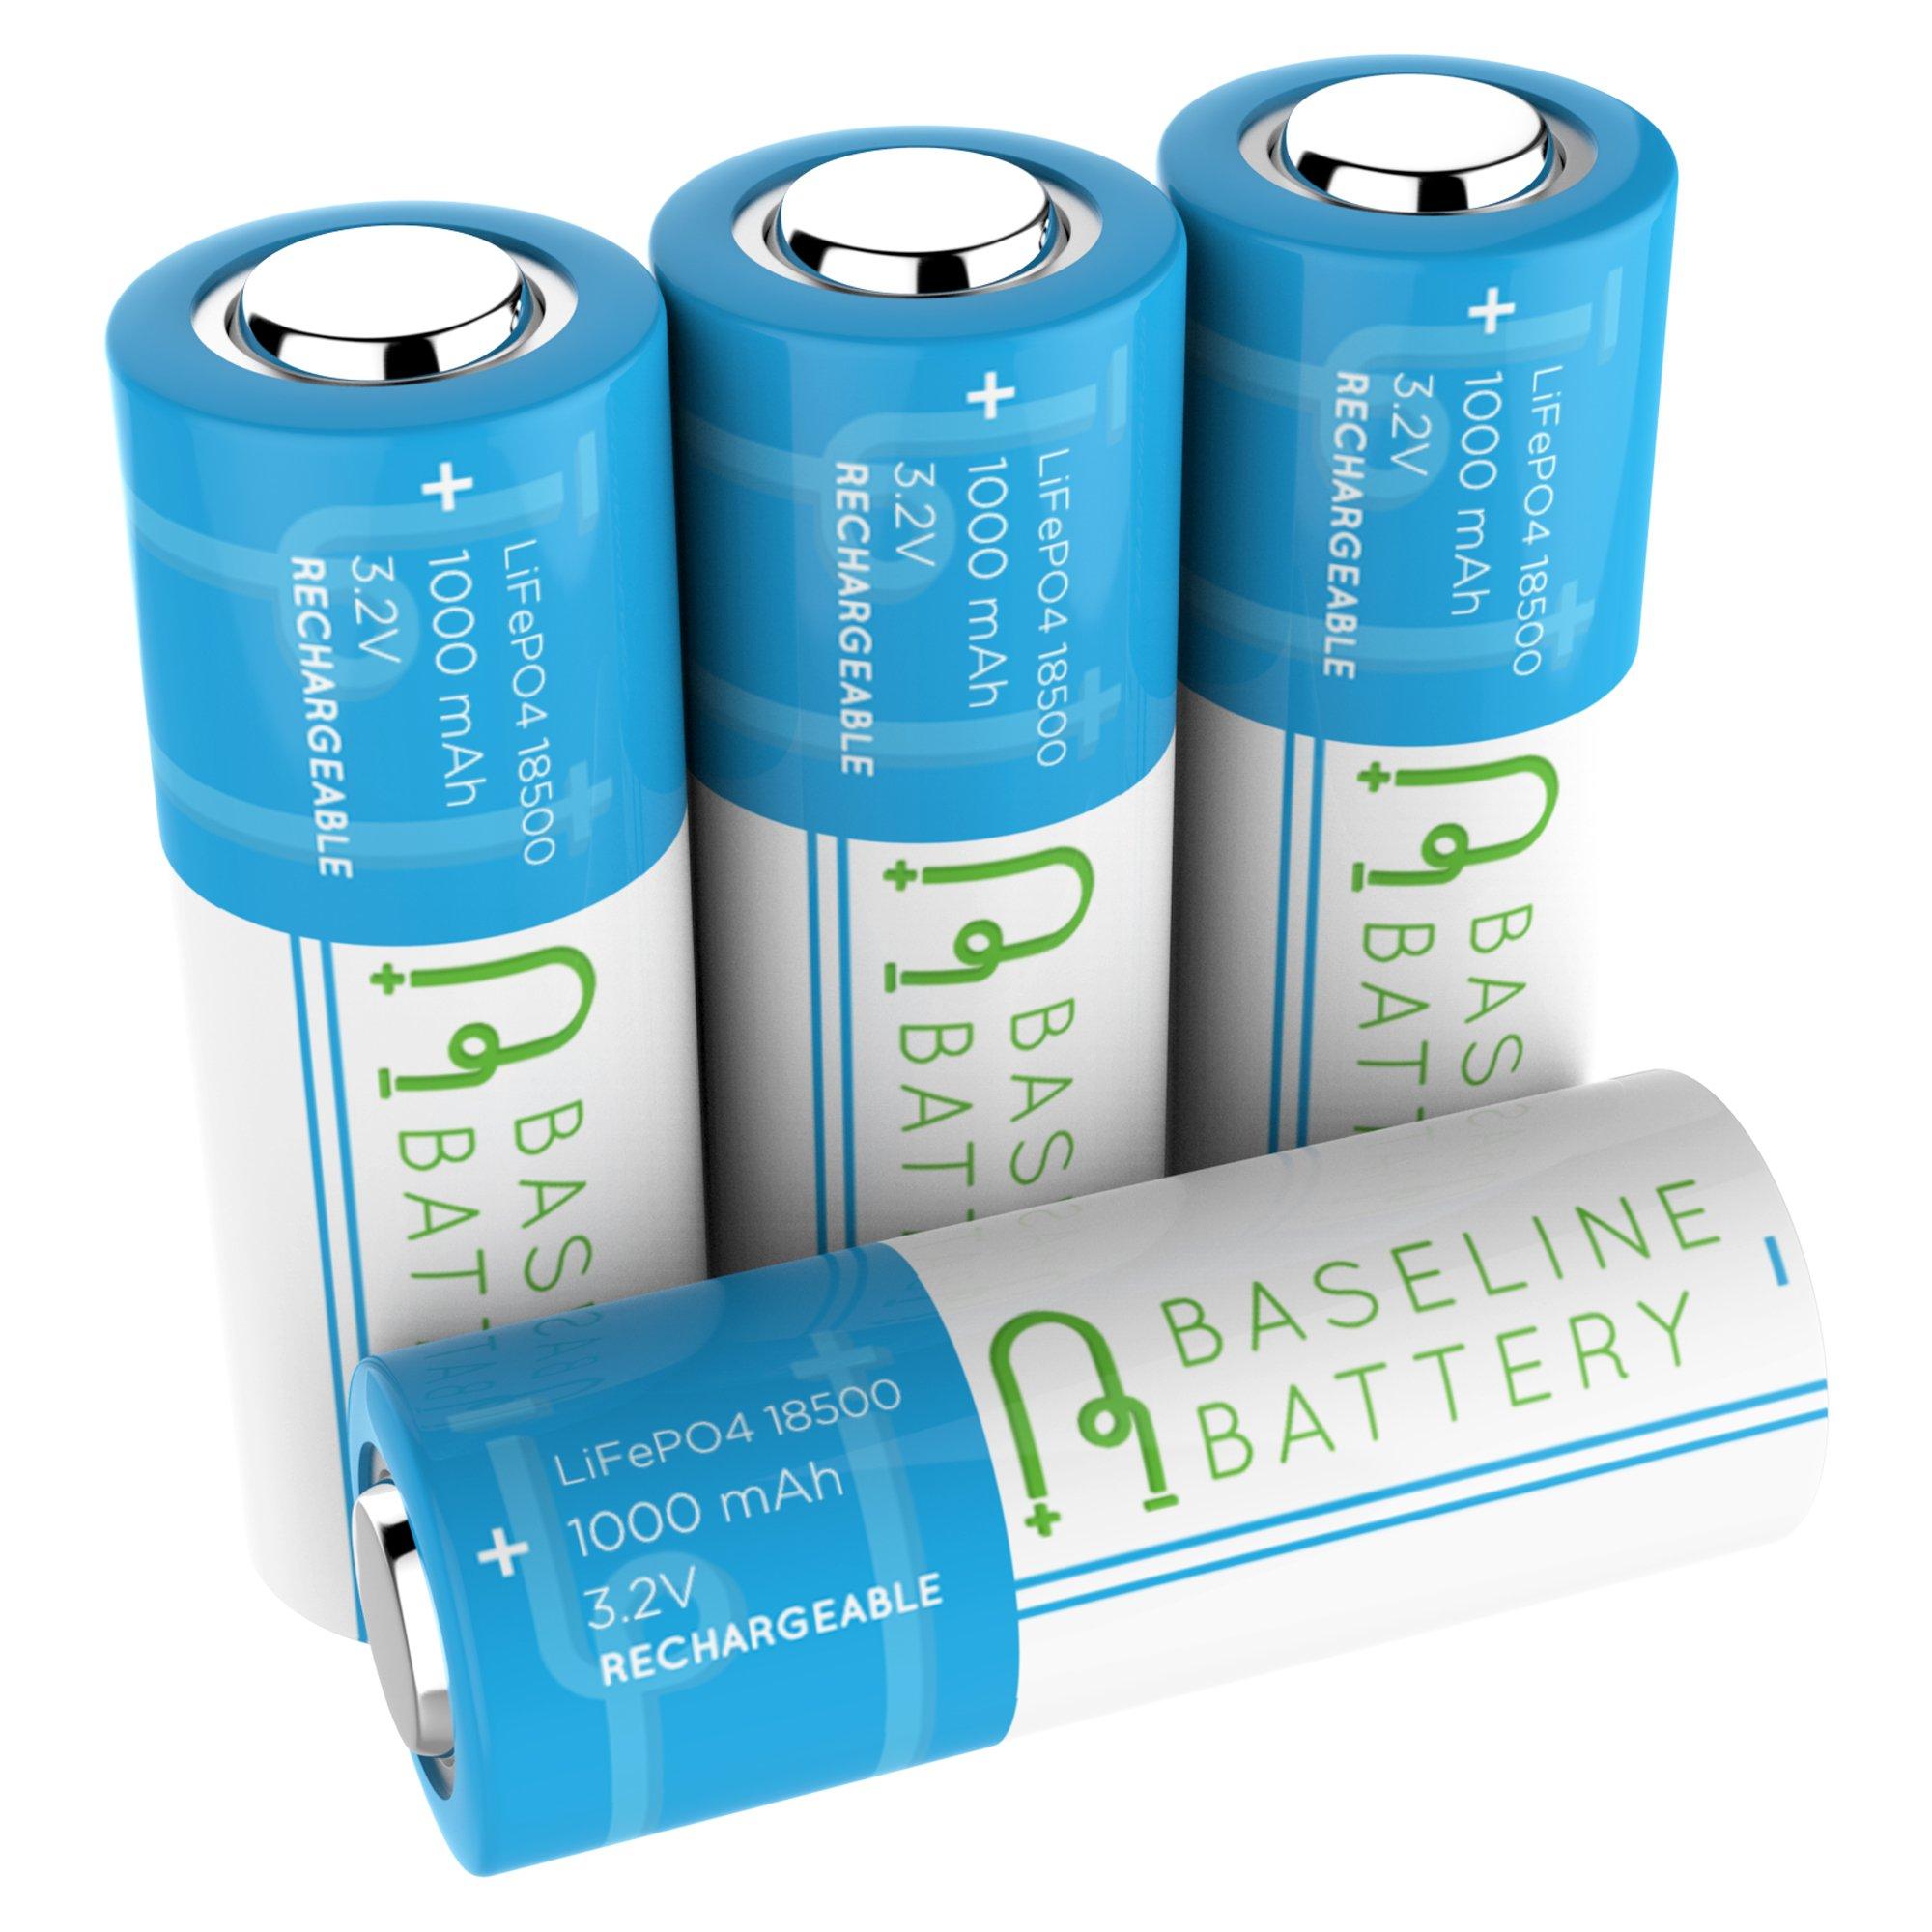 4 Baseline Battery 1000 mAh IFR 18500 3.2v LiFePO4 Lithium Phosphate Rechargeable Batteries Solar Garden Light